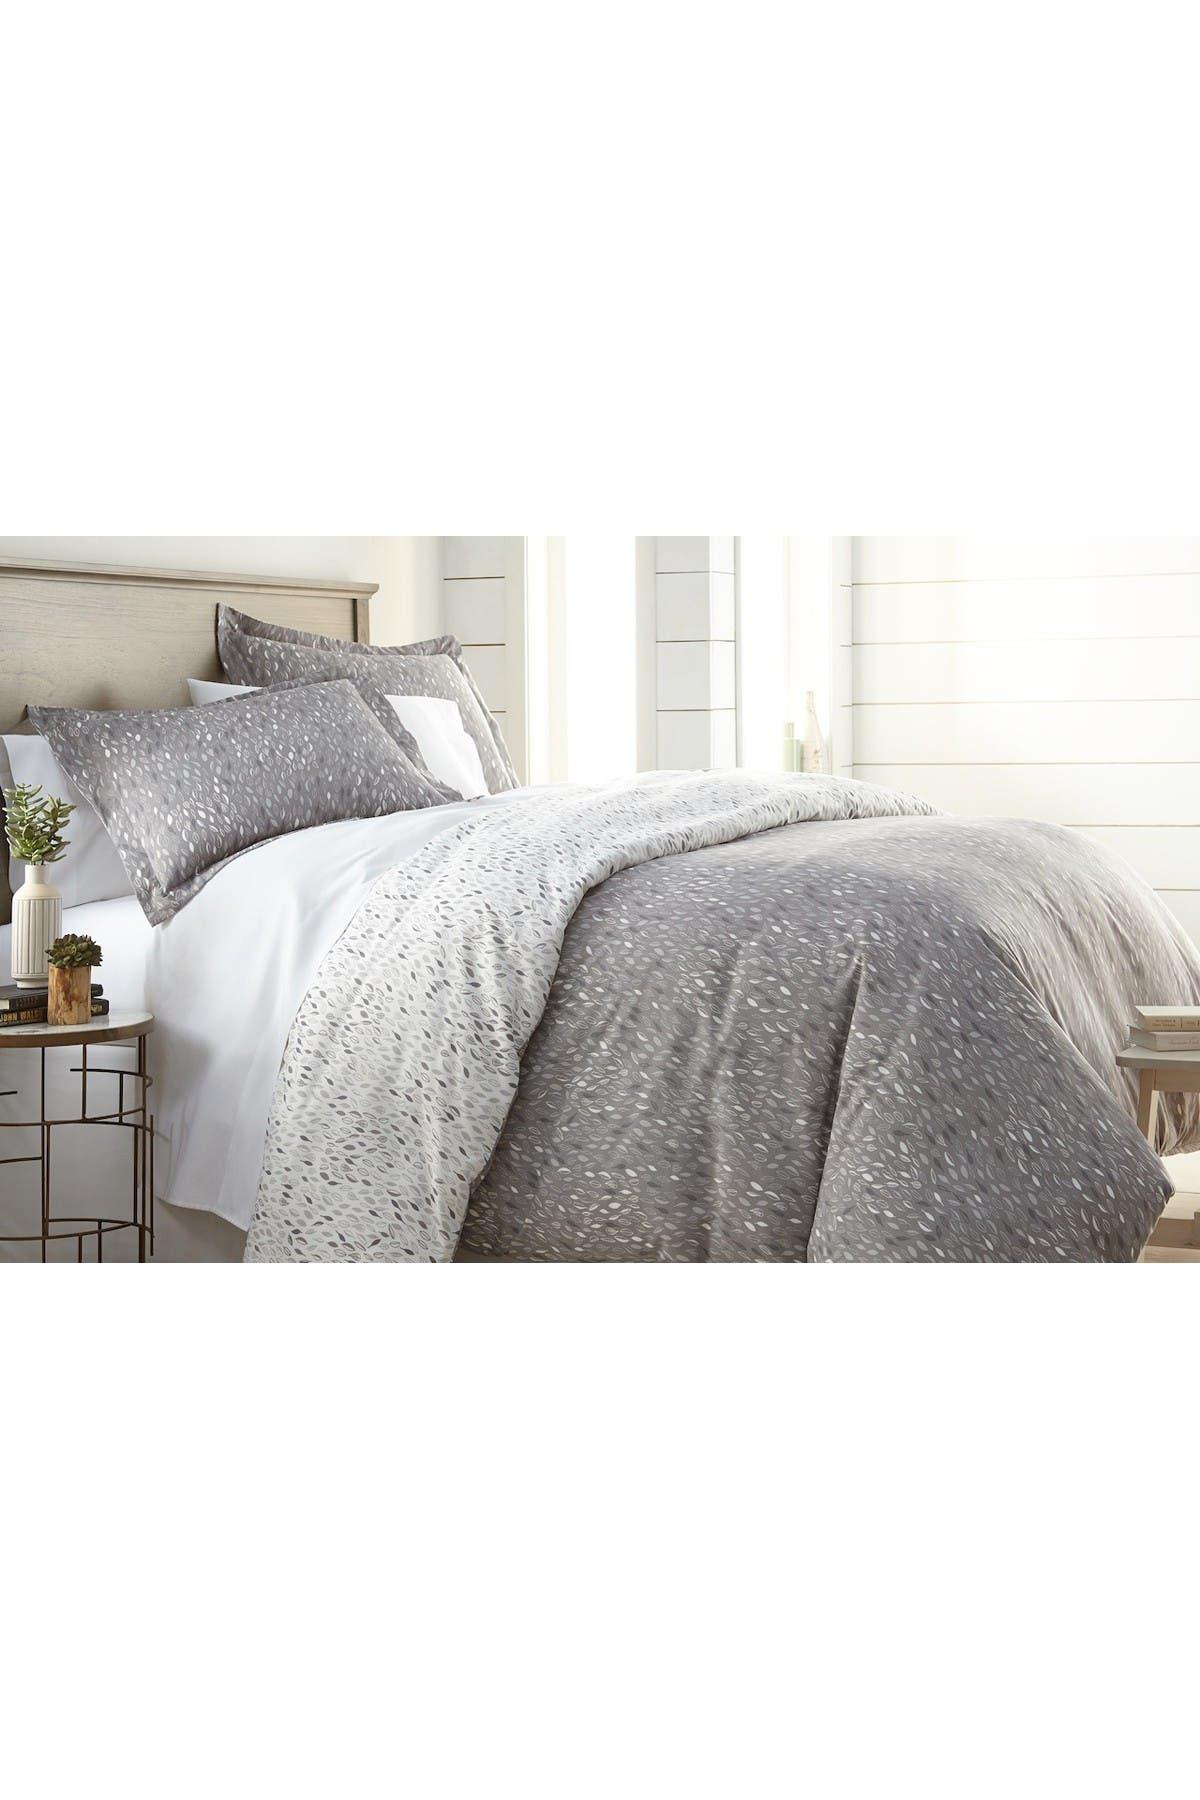 Image of SOUTHSHORE FINE LINENS Luxury Premium Collection Oversized Comforter Set - Full/Queen